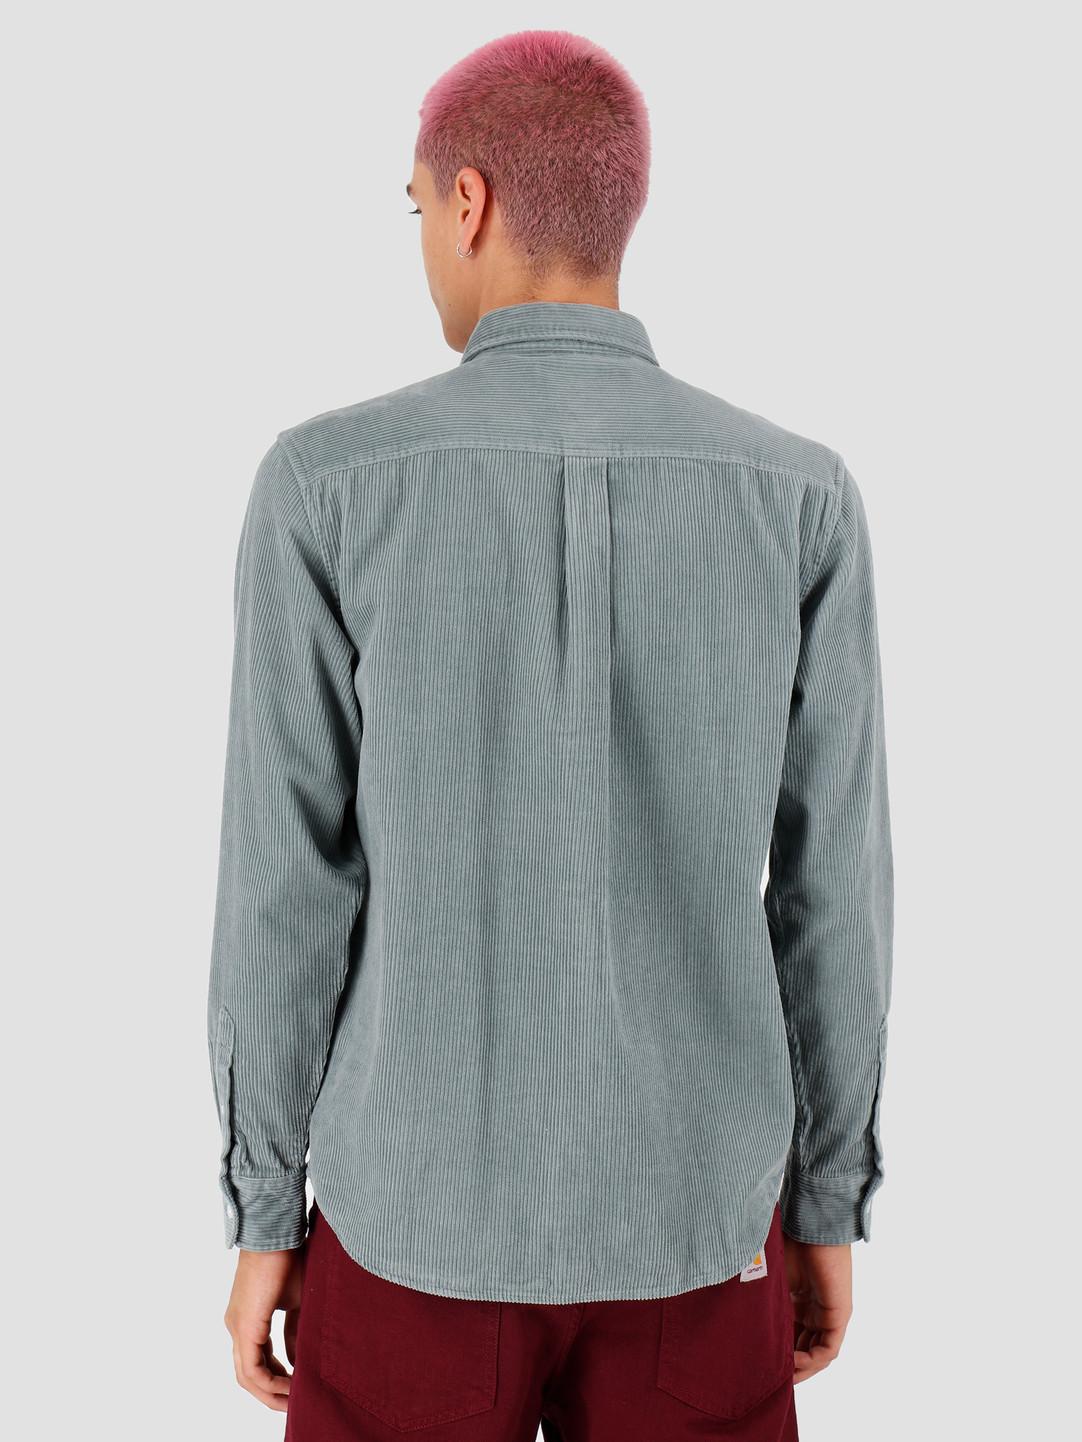 Carhartt WIP Carhartt WIP Longsleeve Madison Cord Shirt Cloudy Flour I025247